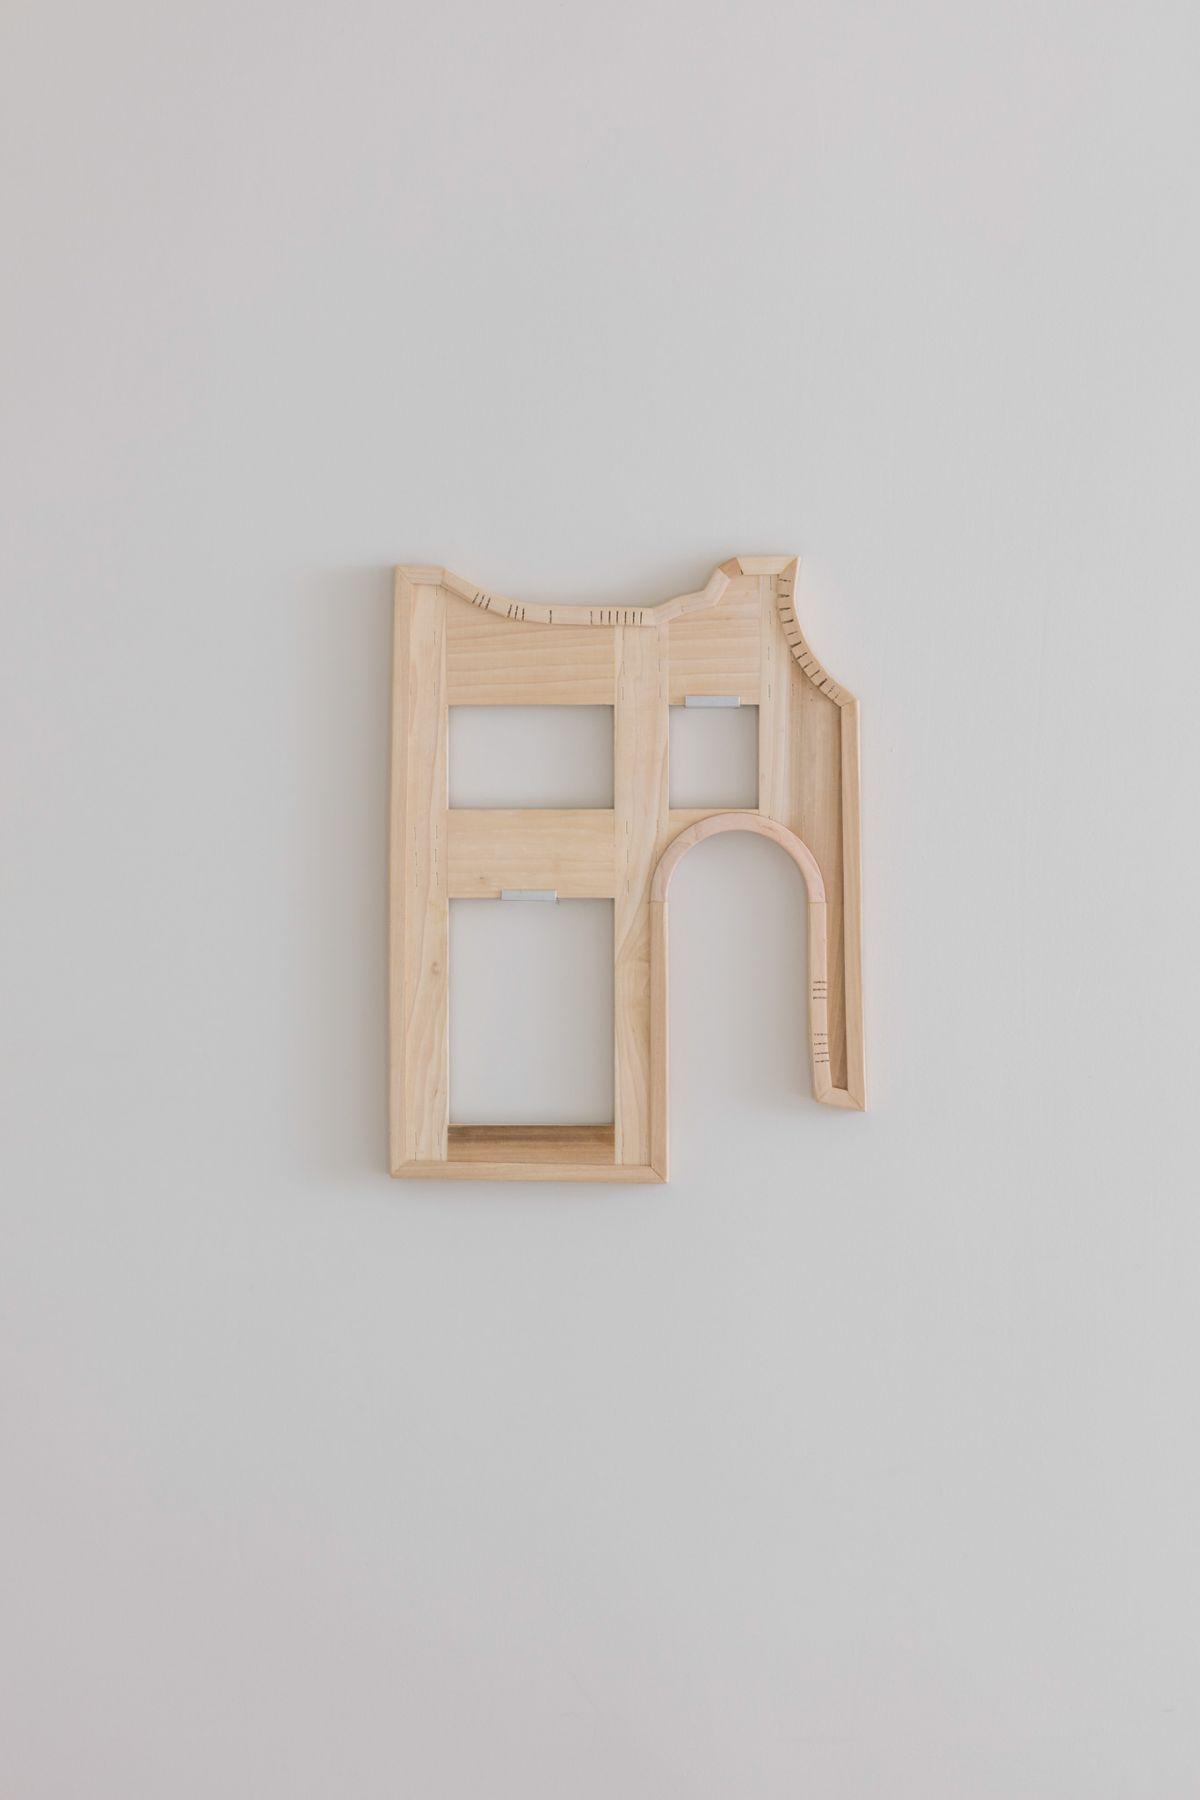 Jacob Kassay, Untitled, 2012-2015